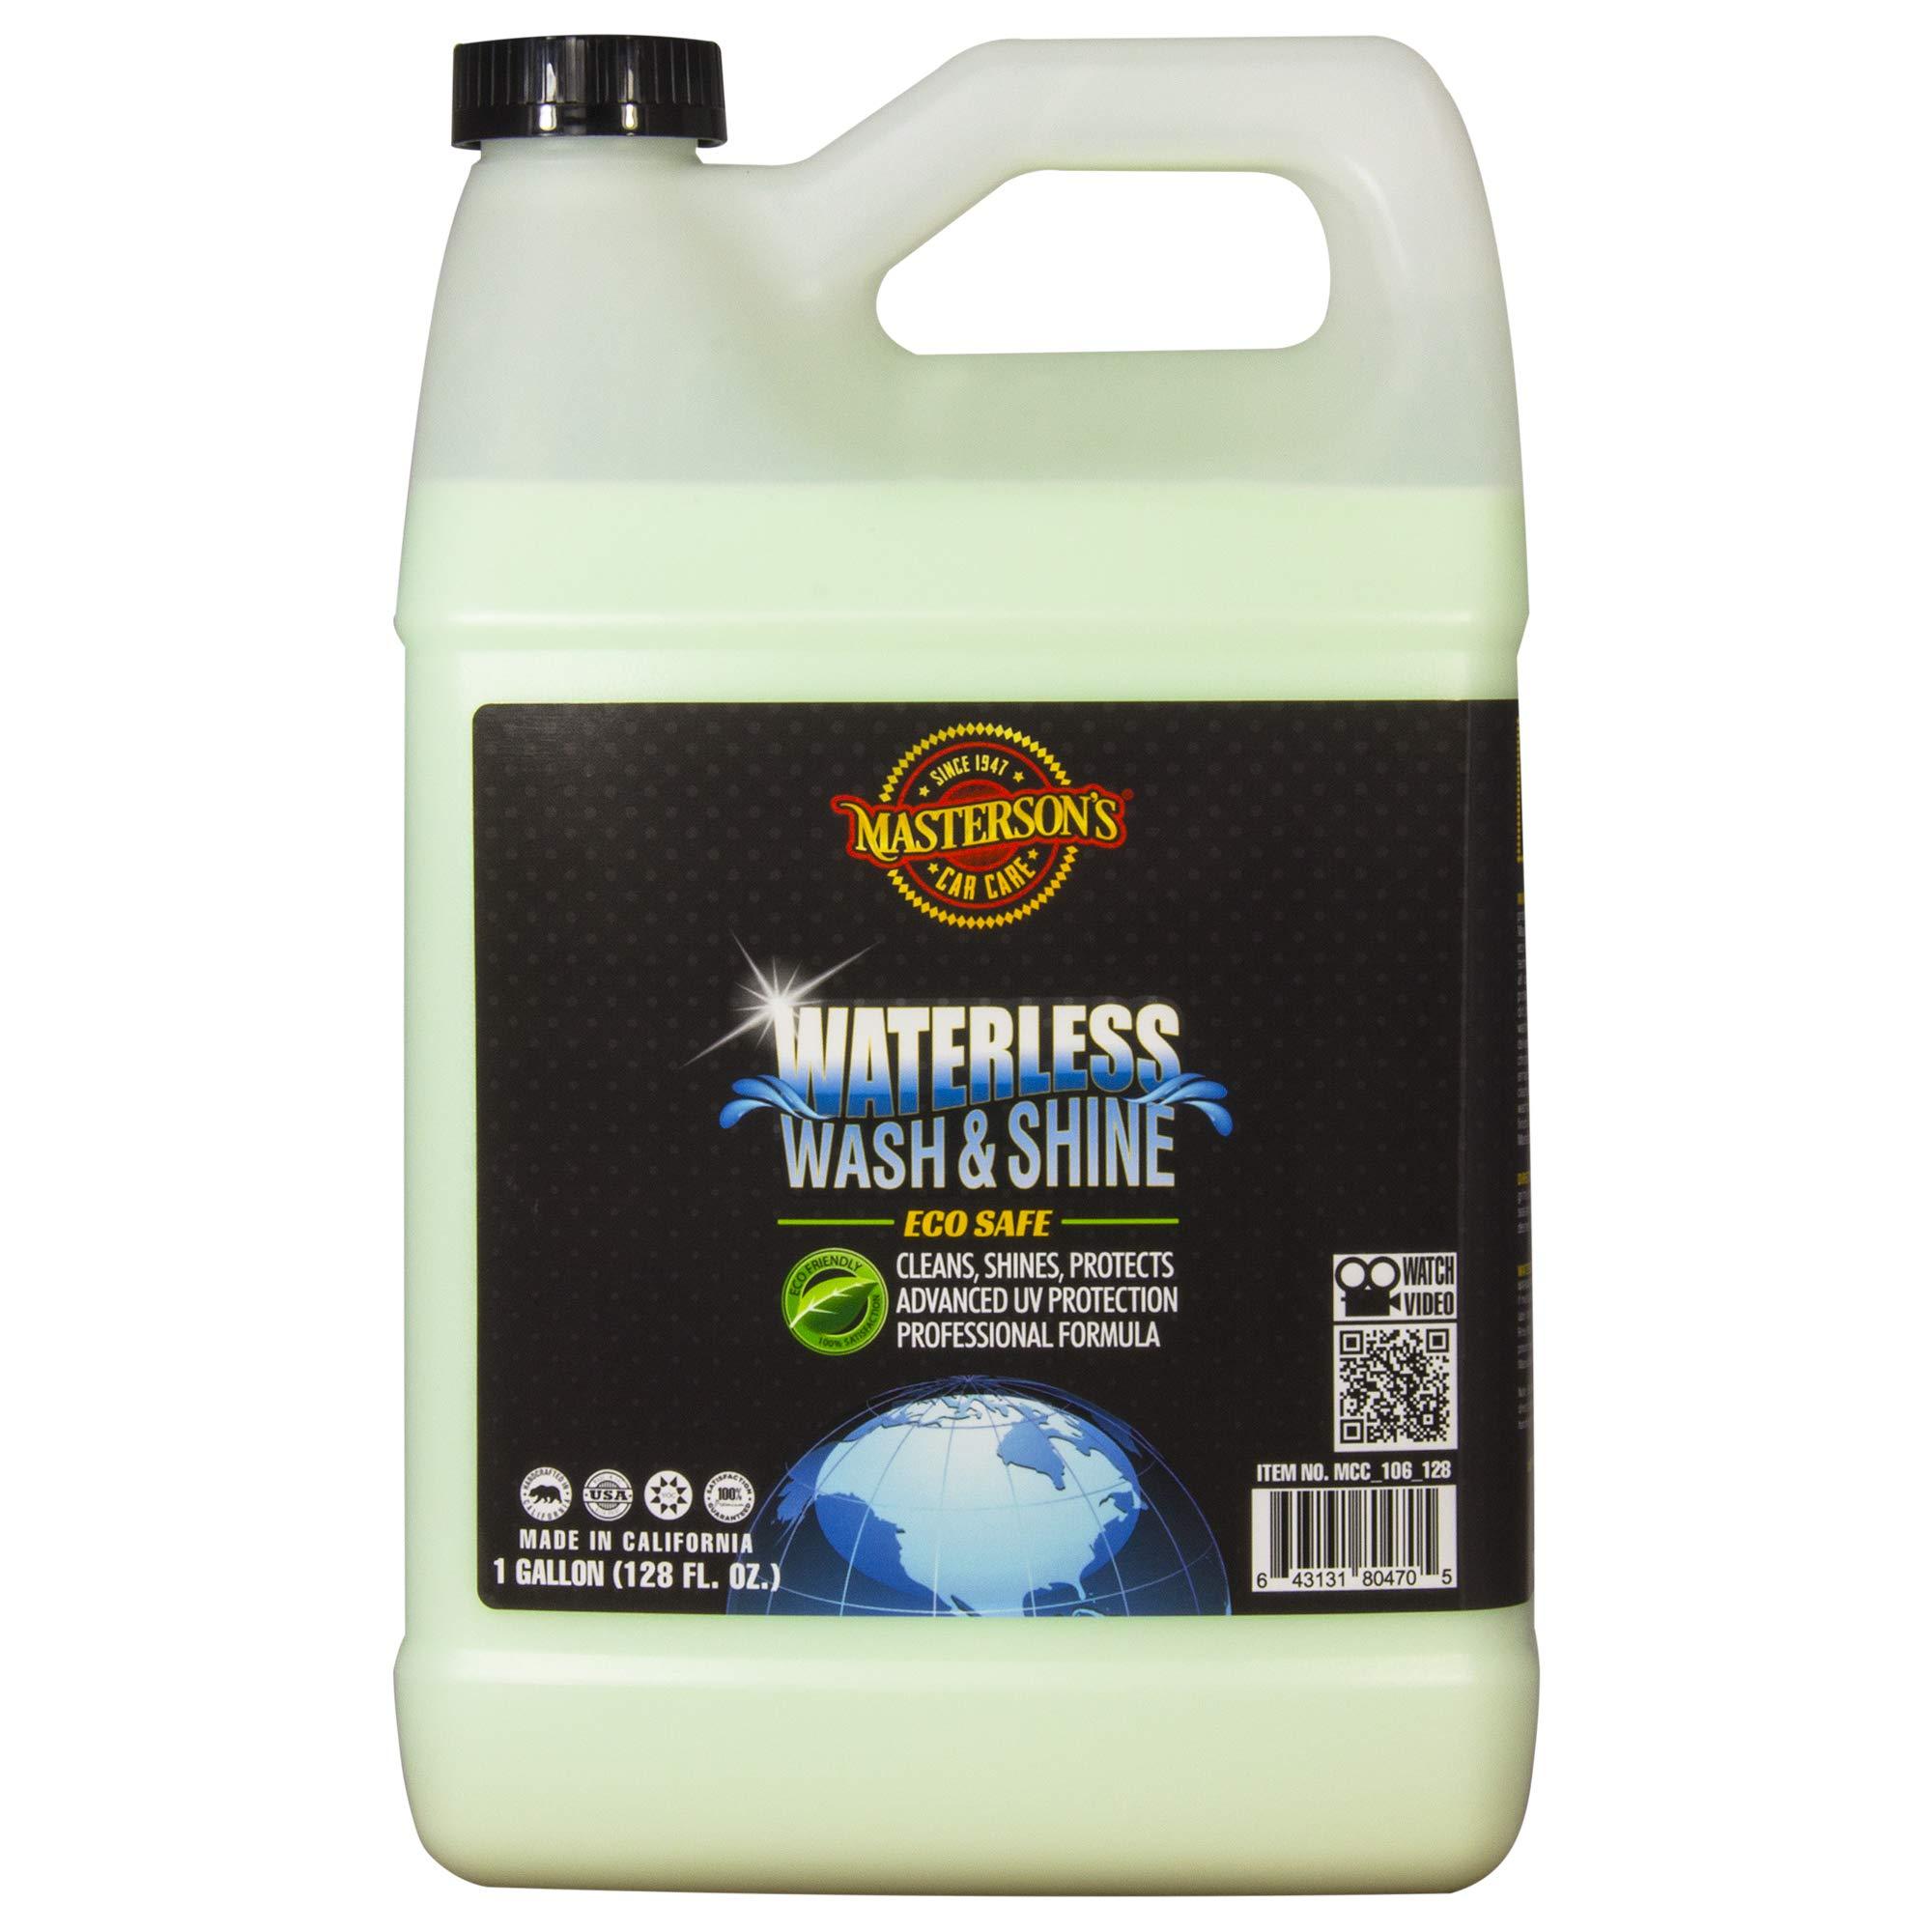 Masterson's Car Care MCC_106_128 Waterless Wash & Shine (1 Gallon)